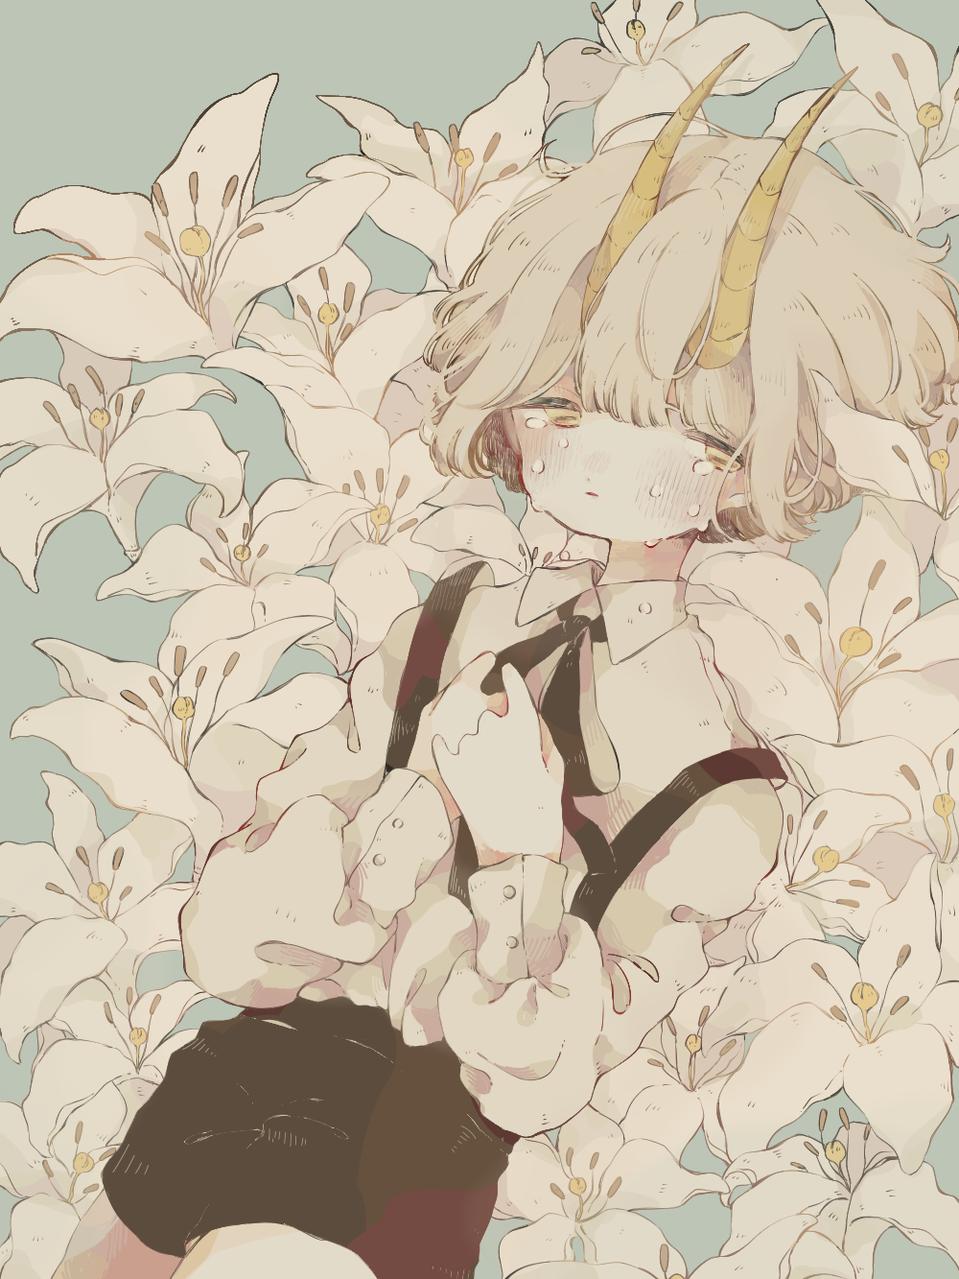 * Illust of mi medibangpaint kawaii ユリ horn